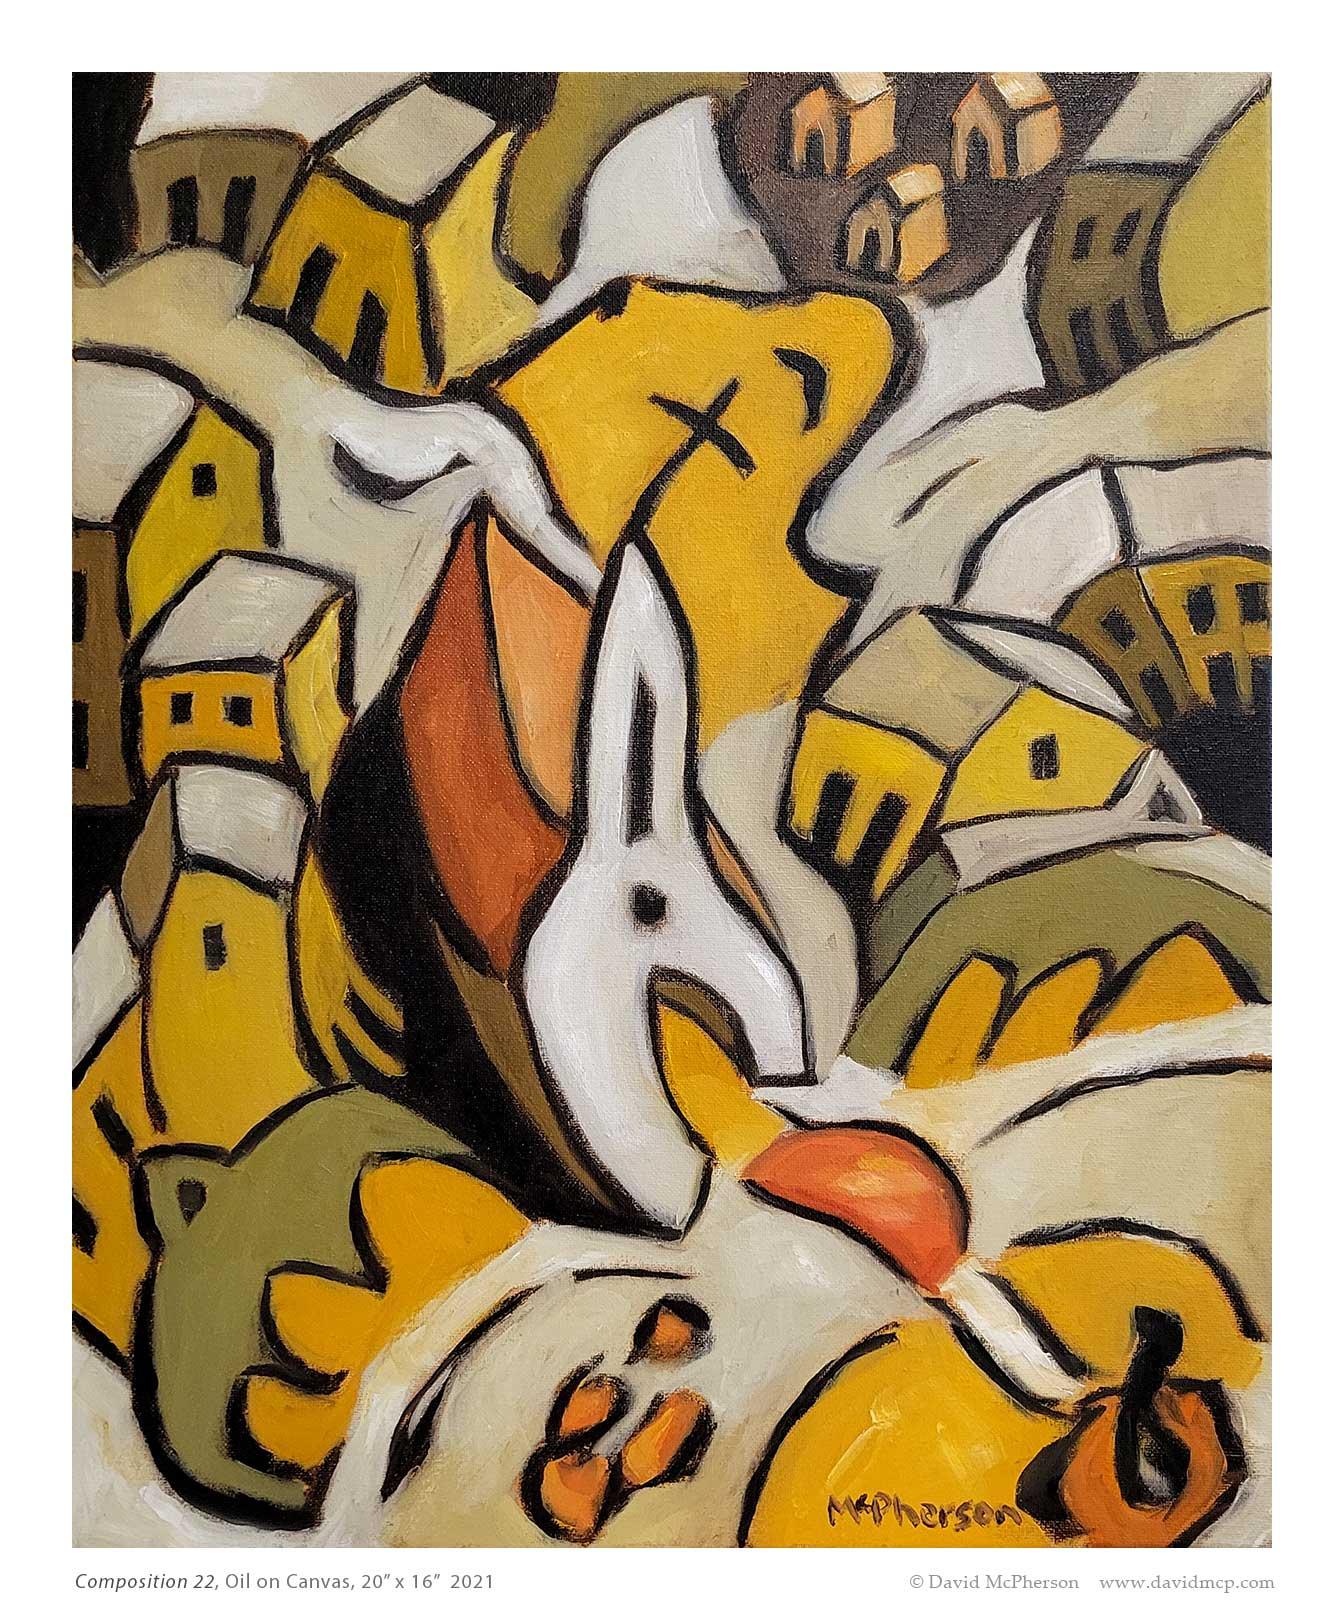 Composition 22, Oil on Canvas, 20 x 16, 2021, McPherson